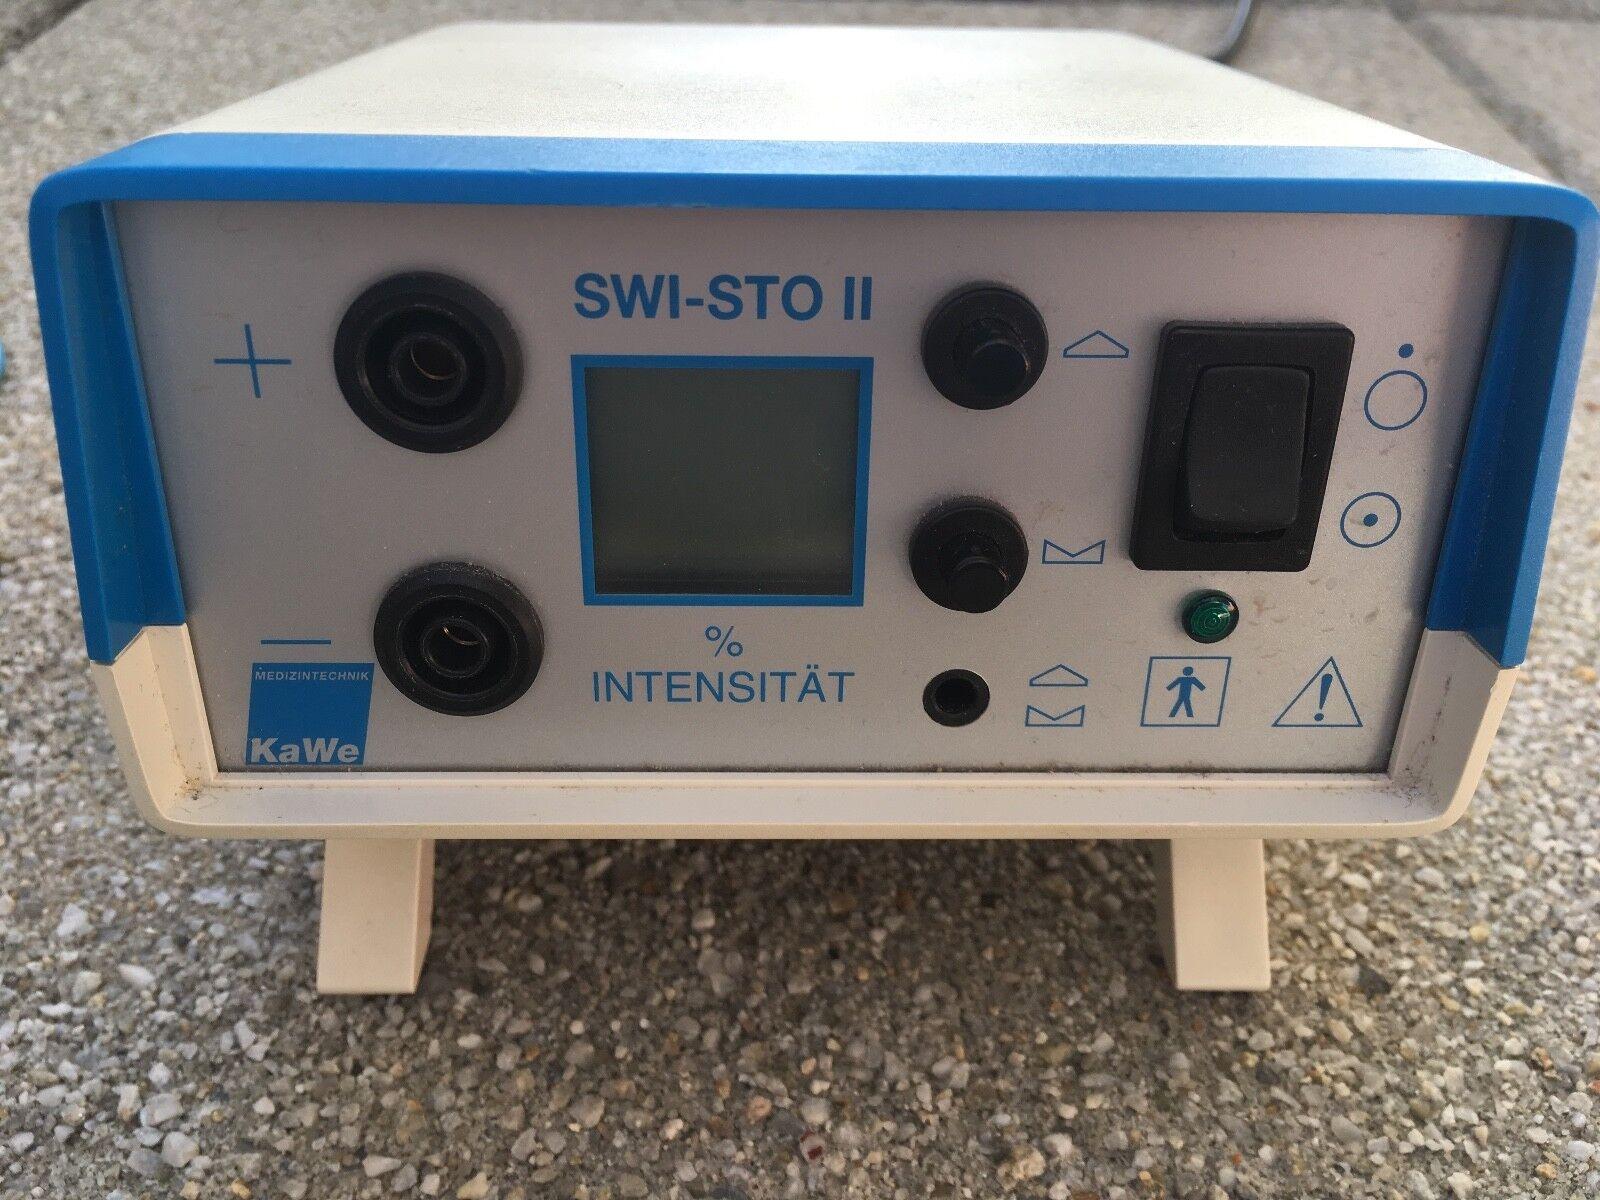 KaWe SwiSto 2 Iontophorese Komplett-Set - Iontophoresegerät gegen schwitzen